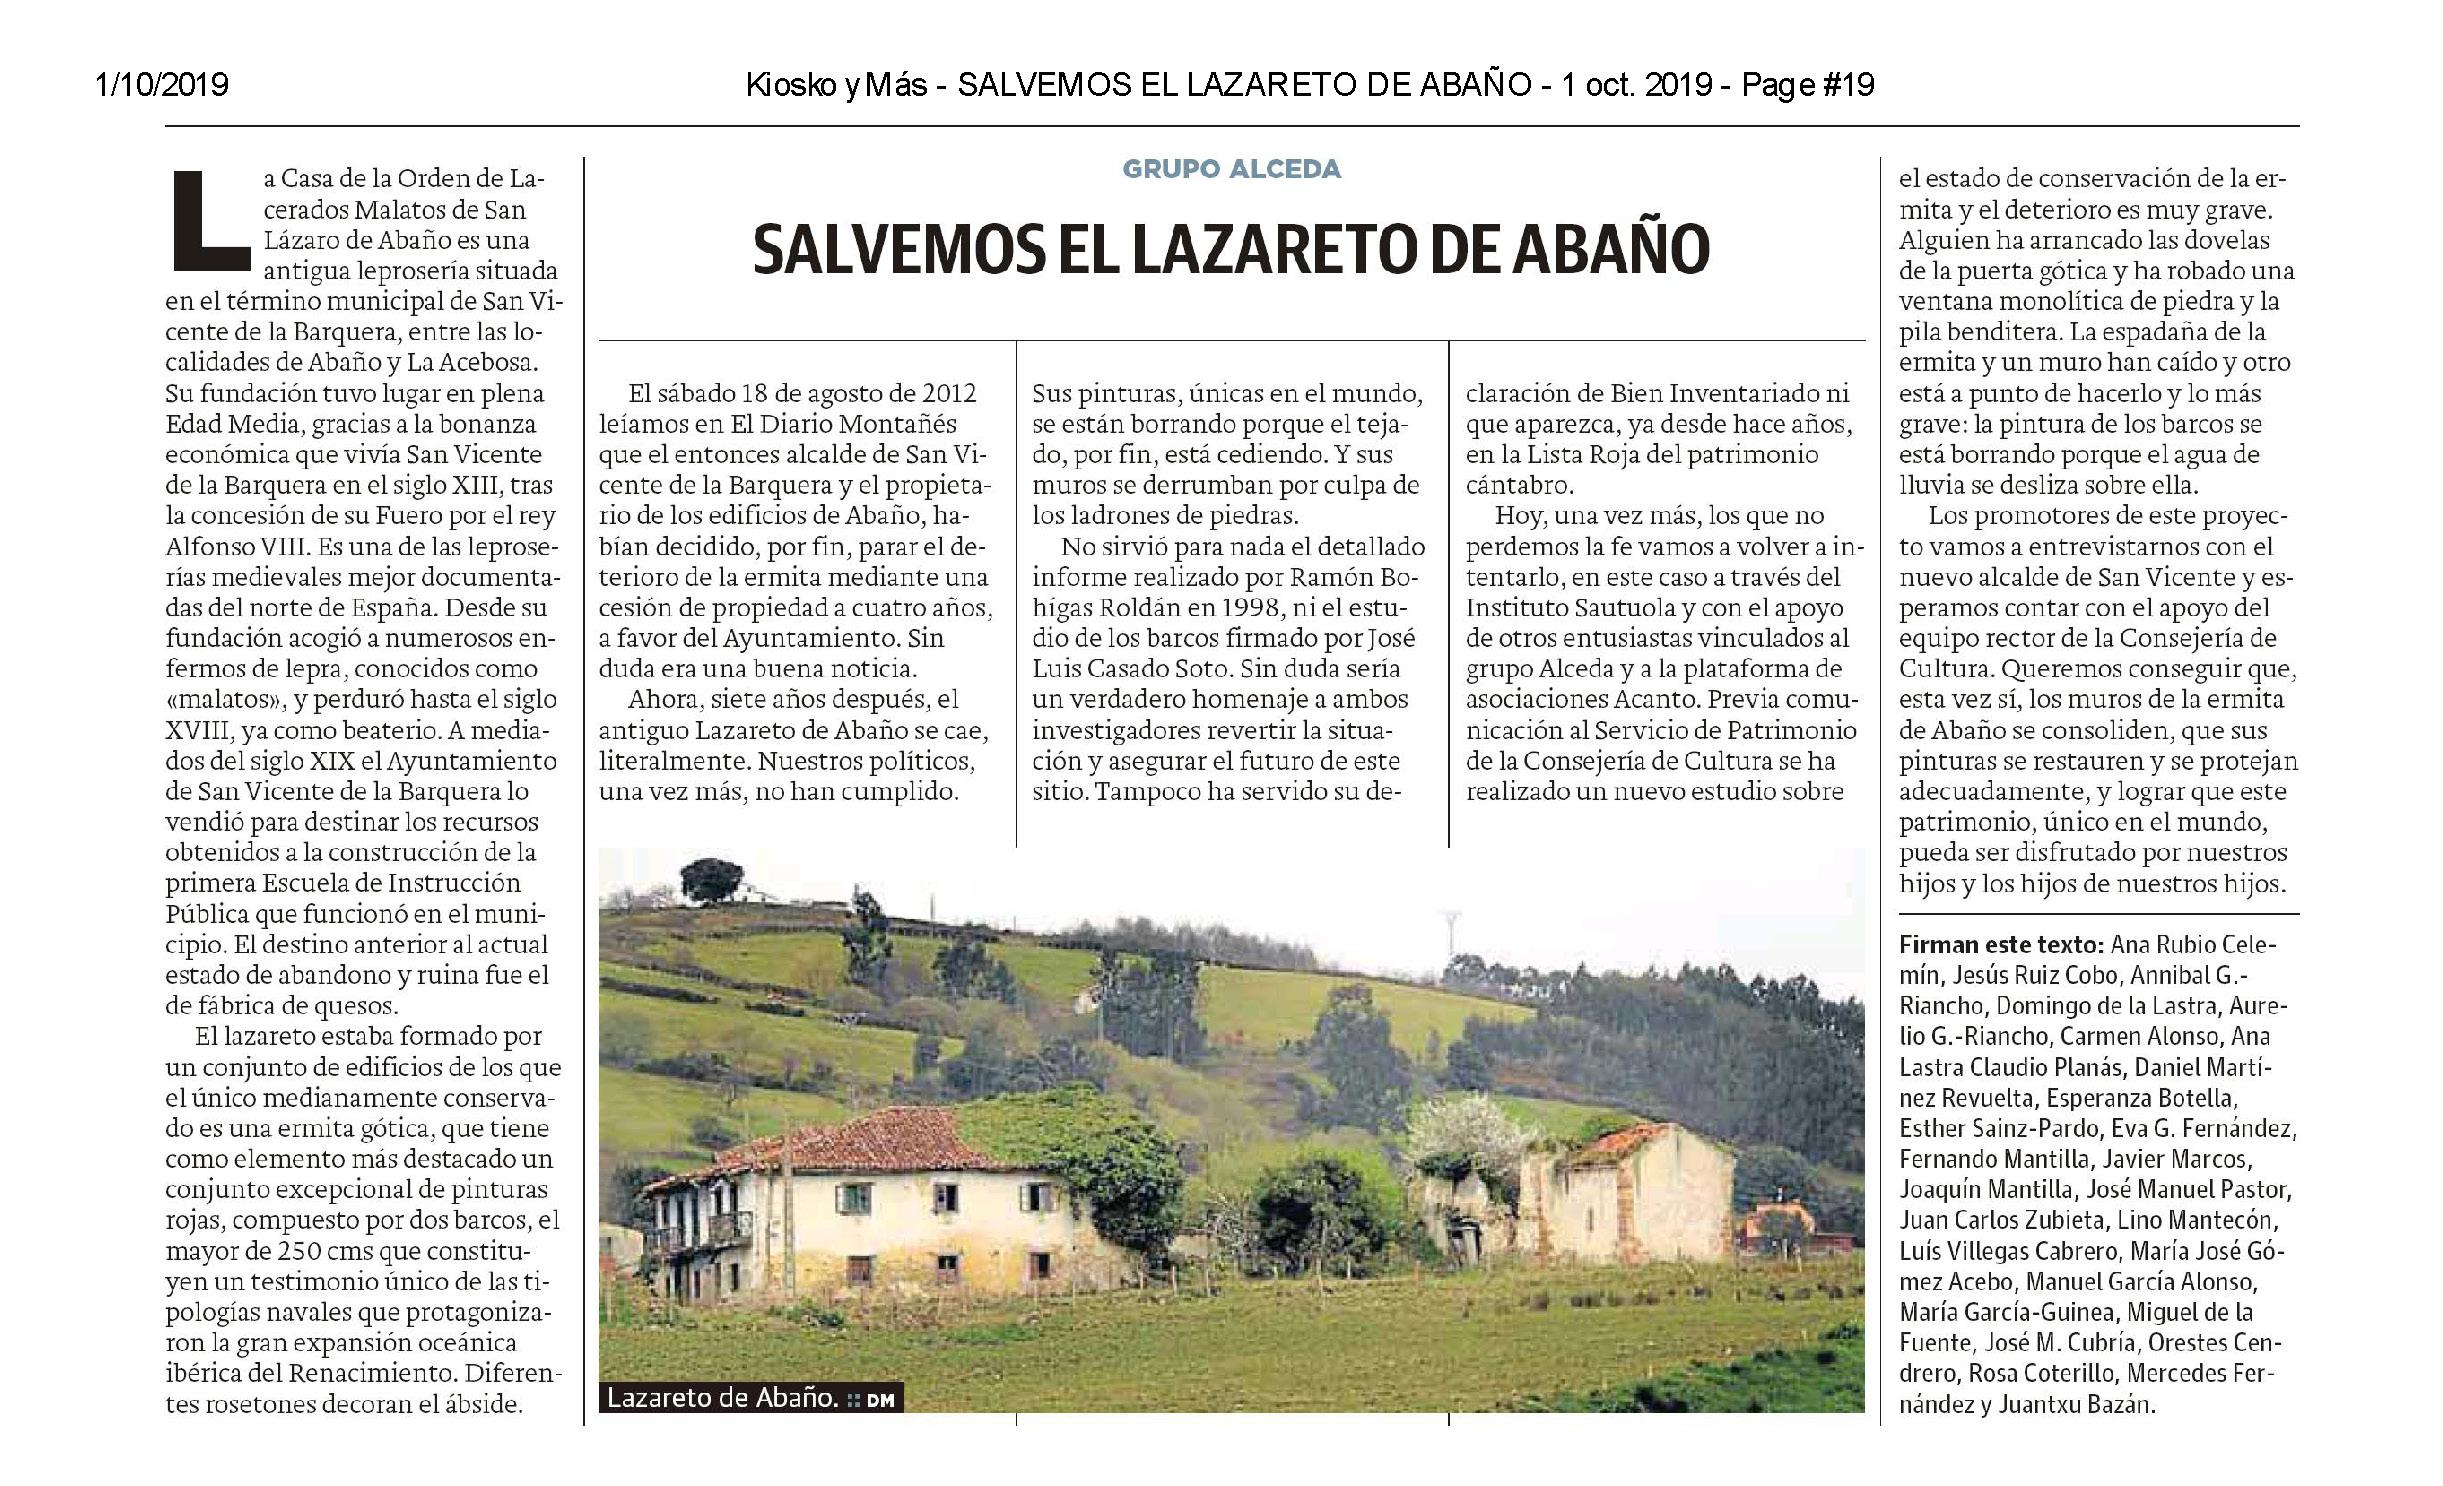 Tribuna Grupo Alceda, D Mont, Lazareto de Abaño (1 oct 2019)